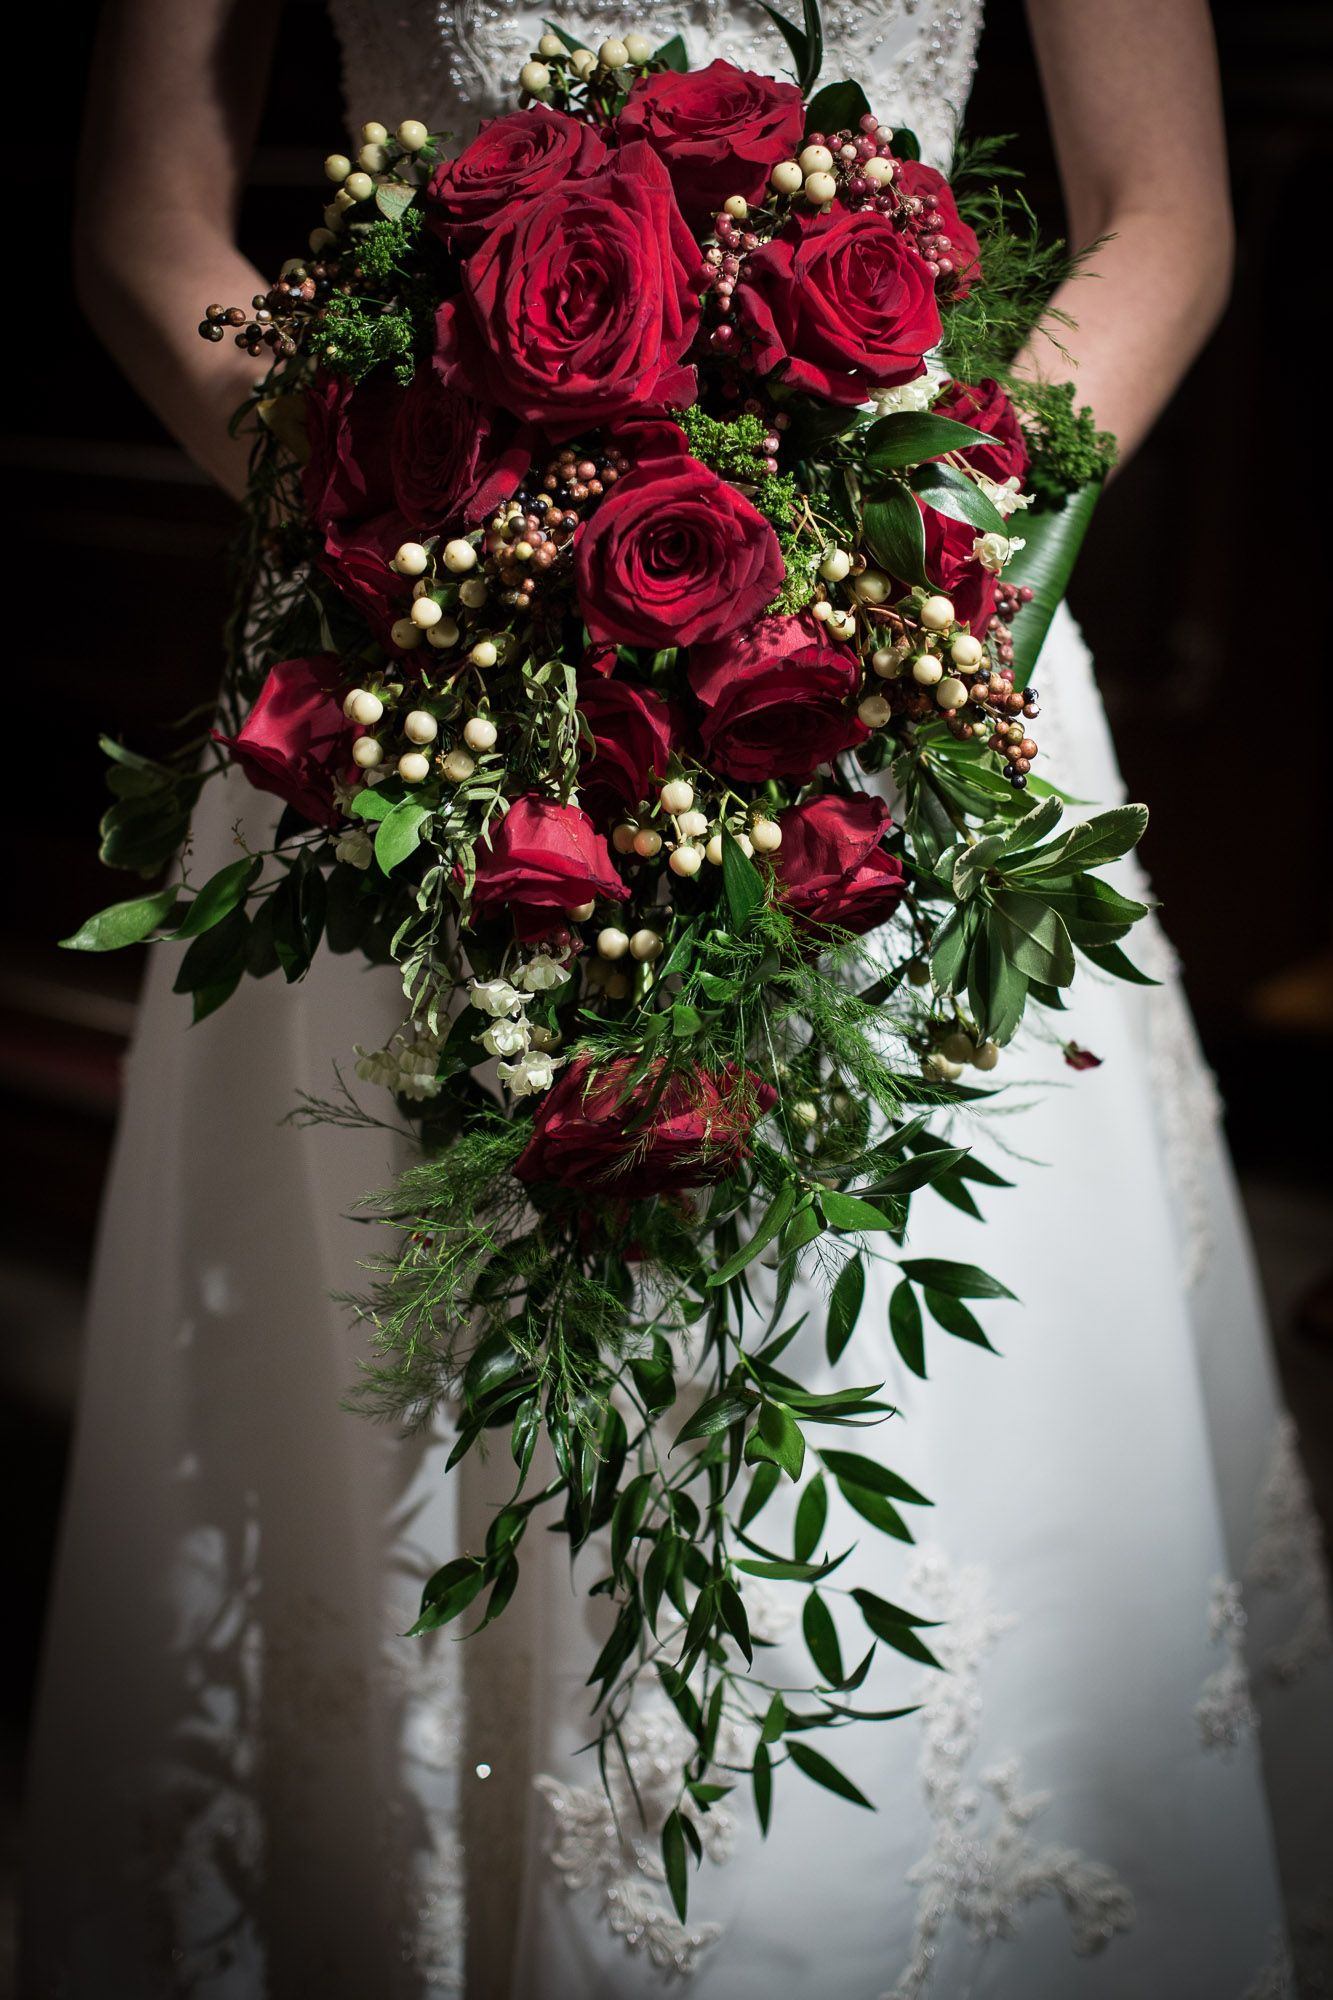 Wedding Flower Names and Bridal Bouquets | Asparagus fern, Cascading ...